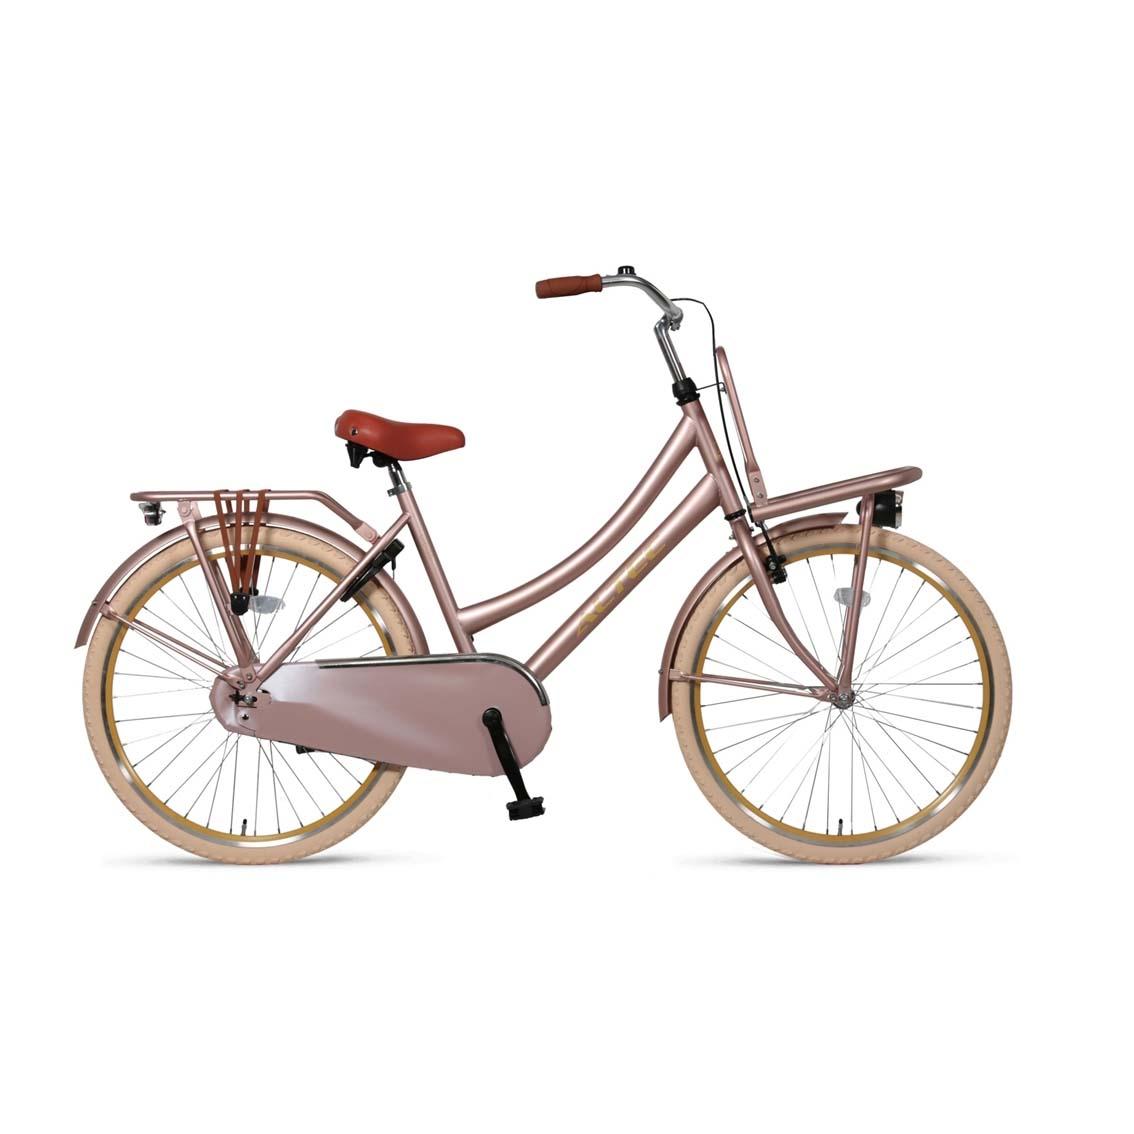 Altec-Urban-26inch-Transportfiets-Lavender-2019 copy